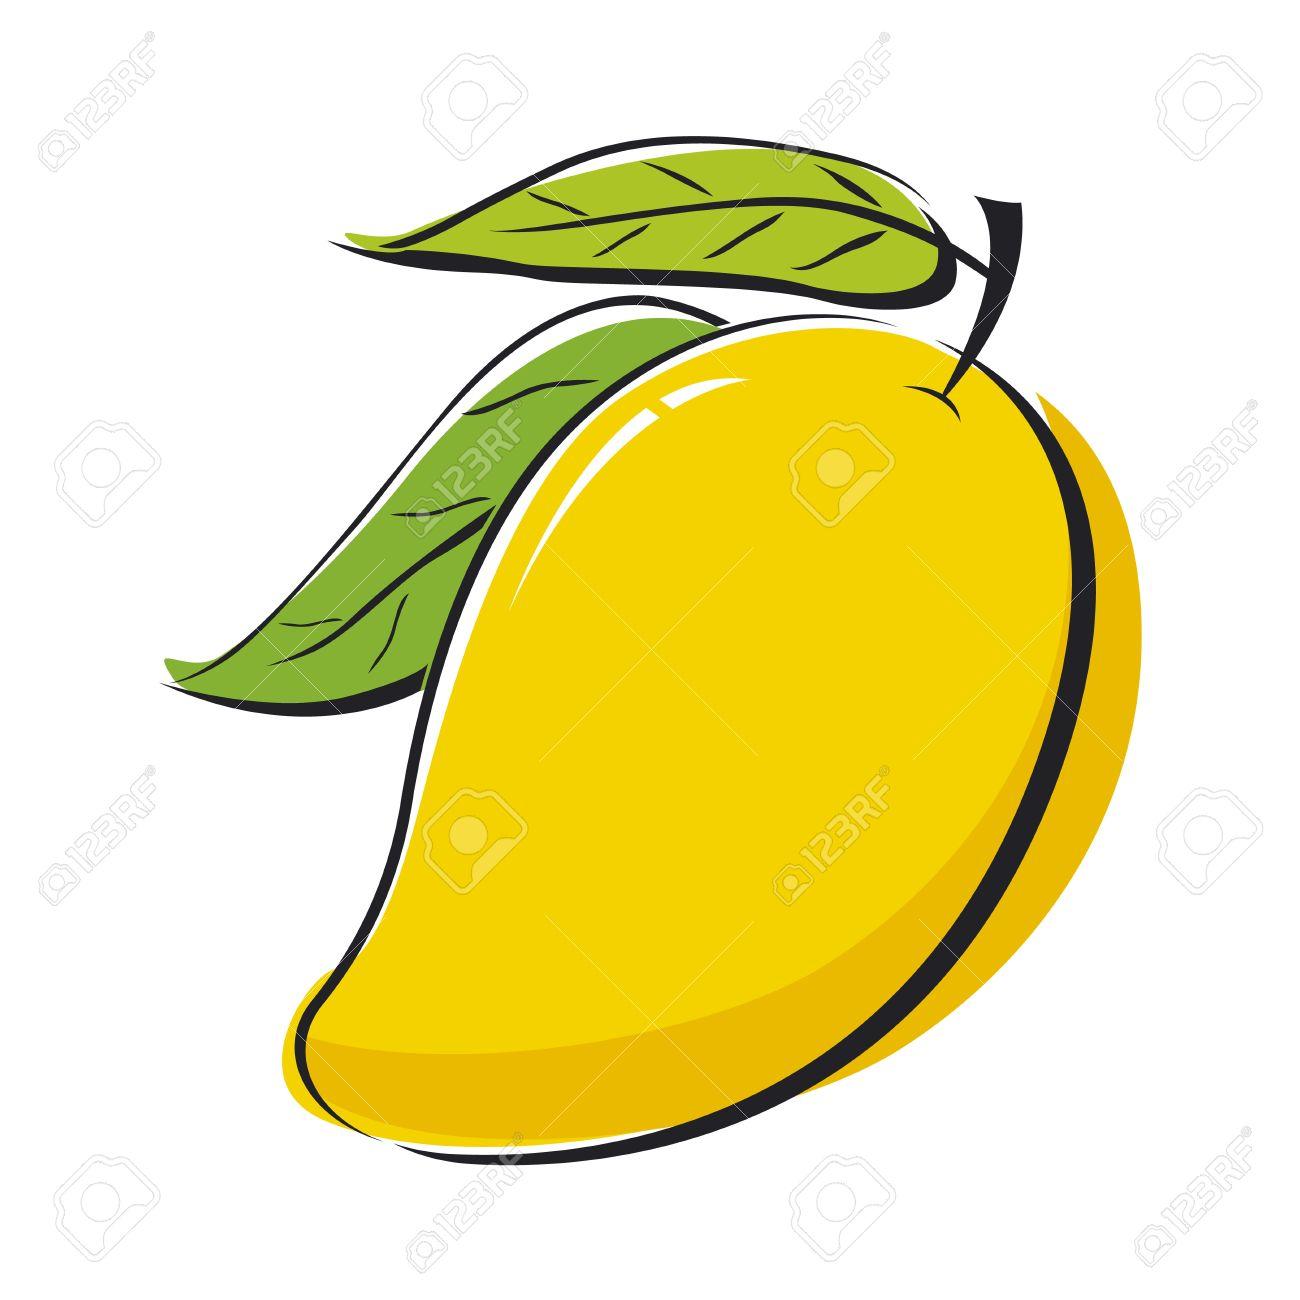 Yellow mango clipart.